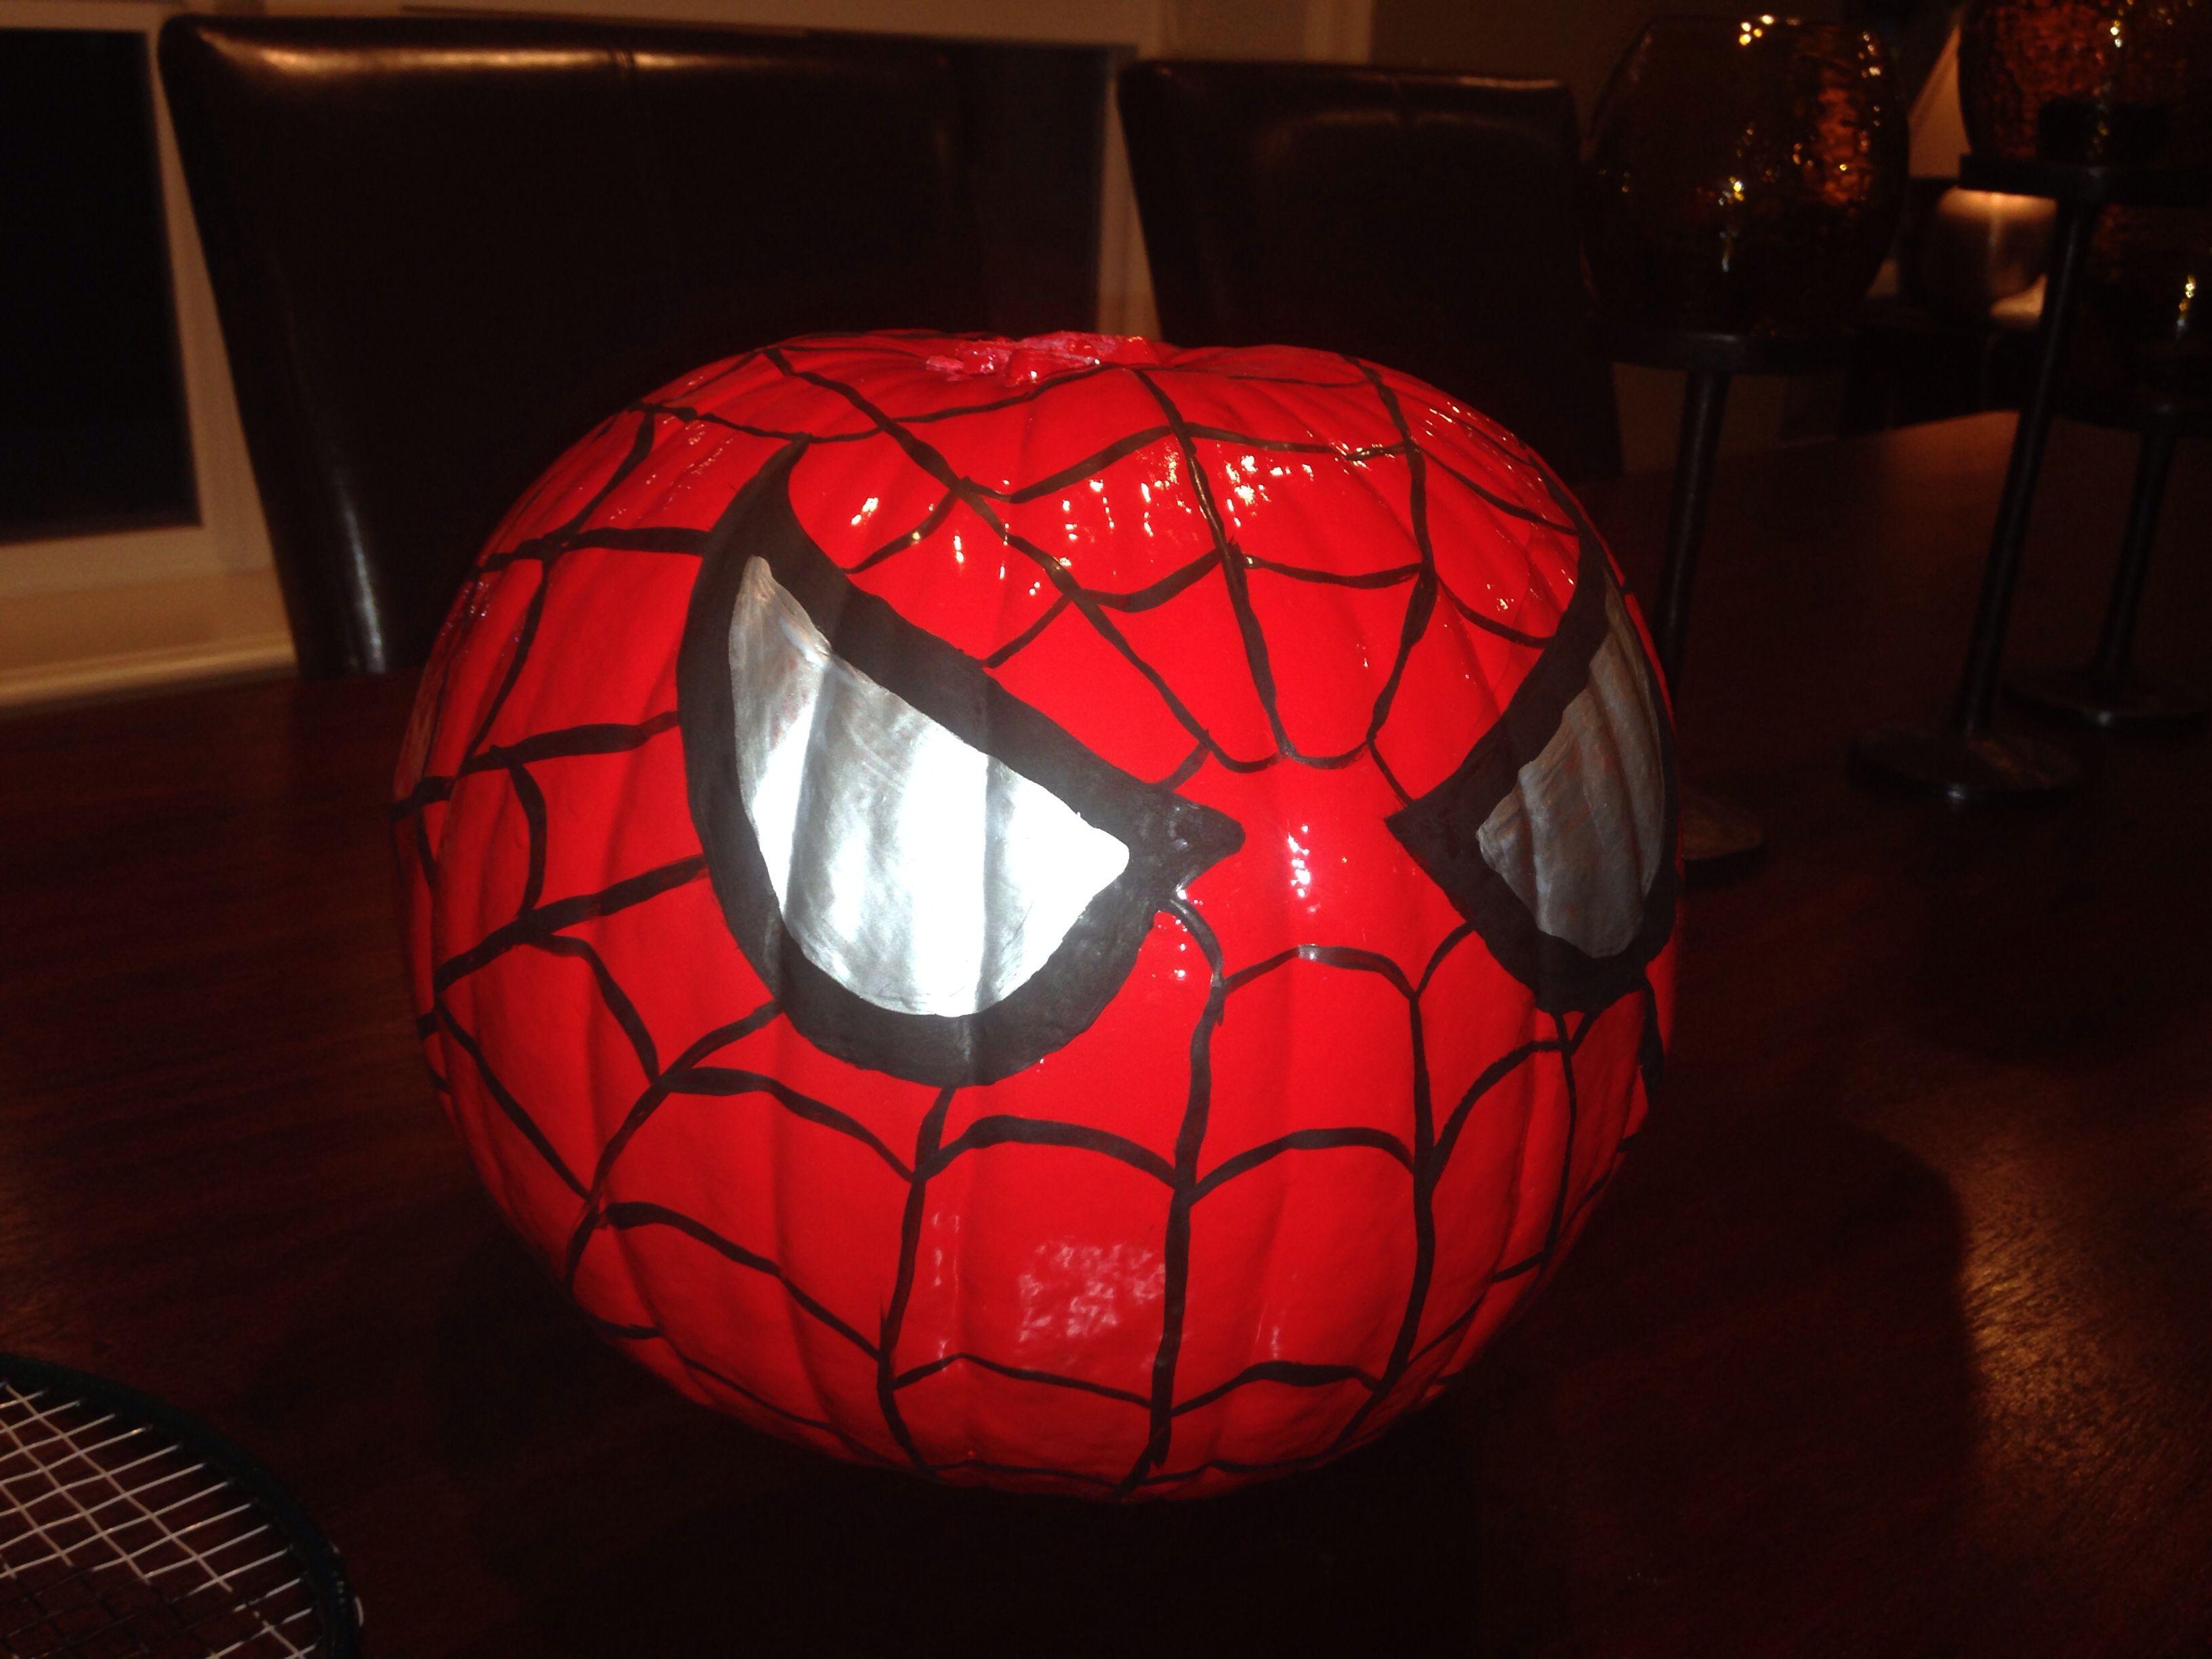 Spider-man painted pumpkin. Next time I'll use craft pumpkins so I ...